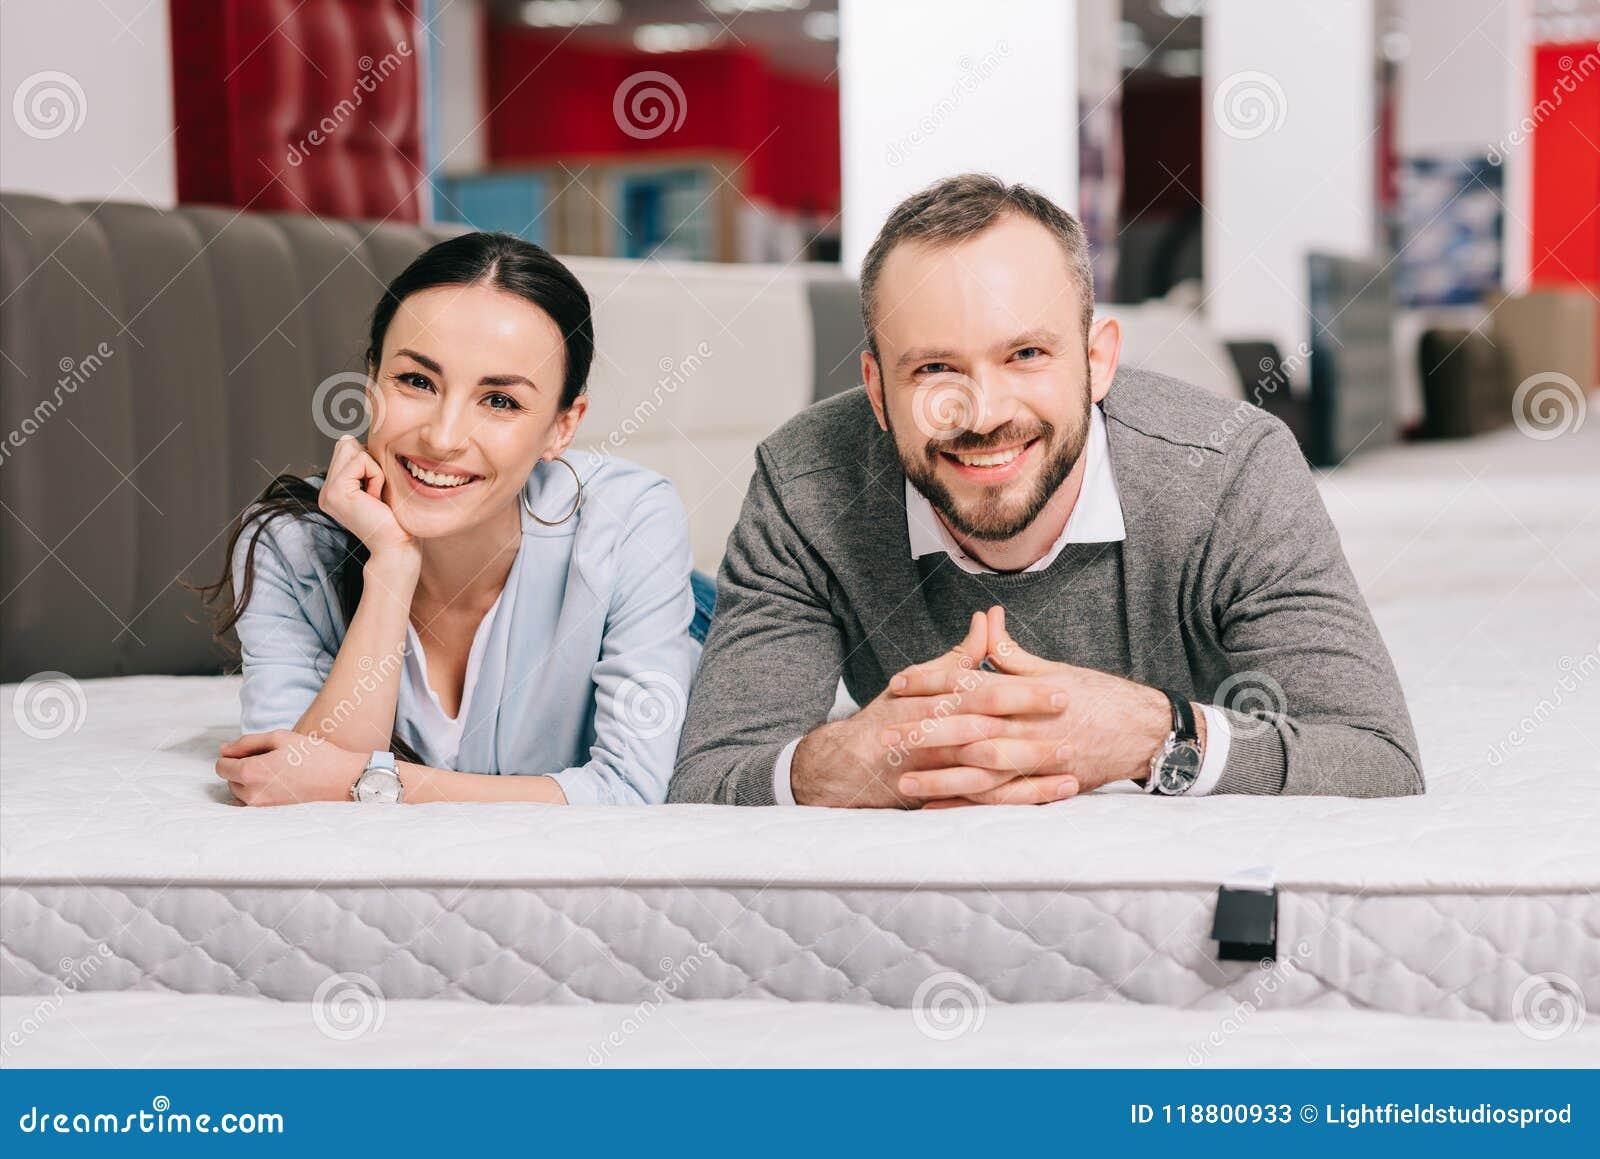 portrait of smiling couple lying on mattress